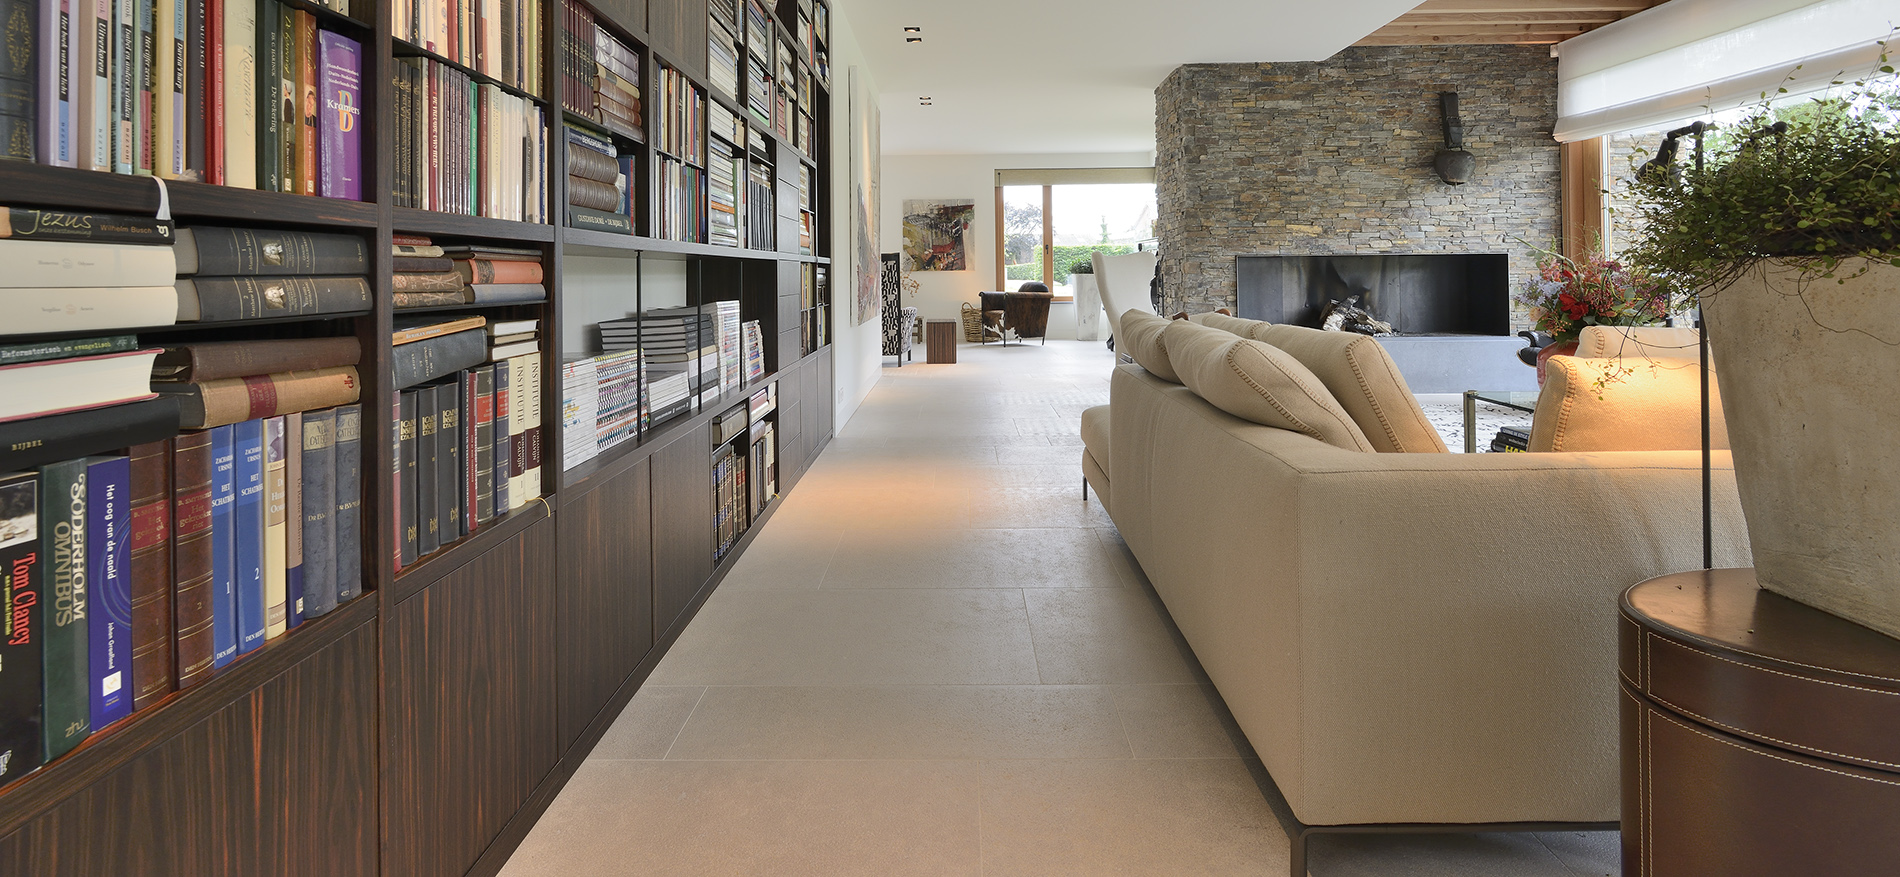 Awesome Meubelen Top Interieur Izegem Images - Huis & Interieur ...